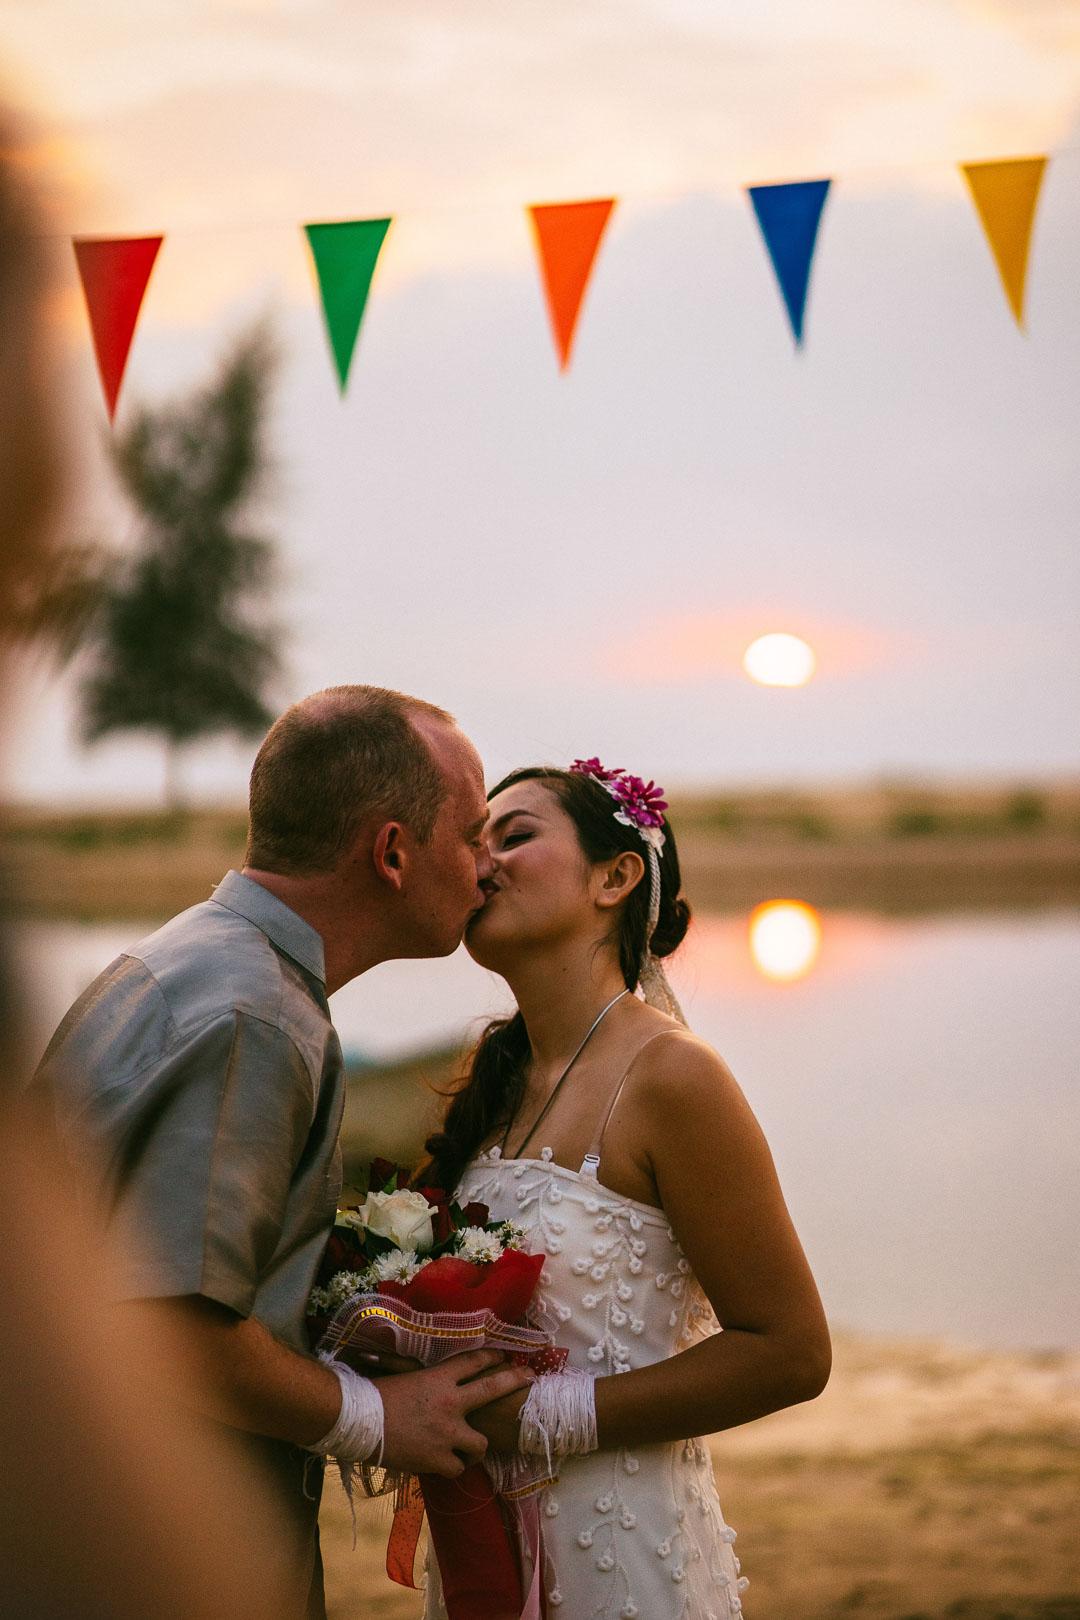 Thailand Wedding Photographer - Krabi/Khao Lak/Phuket